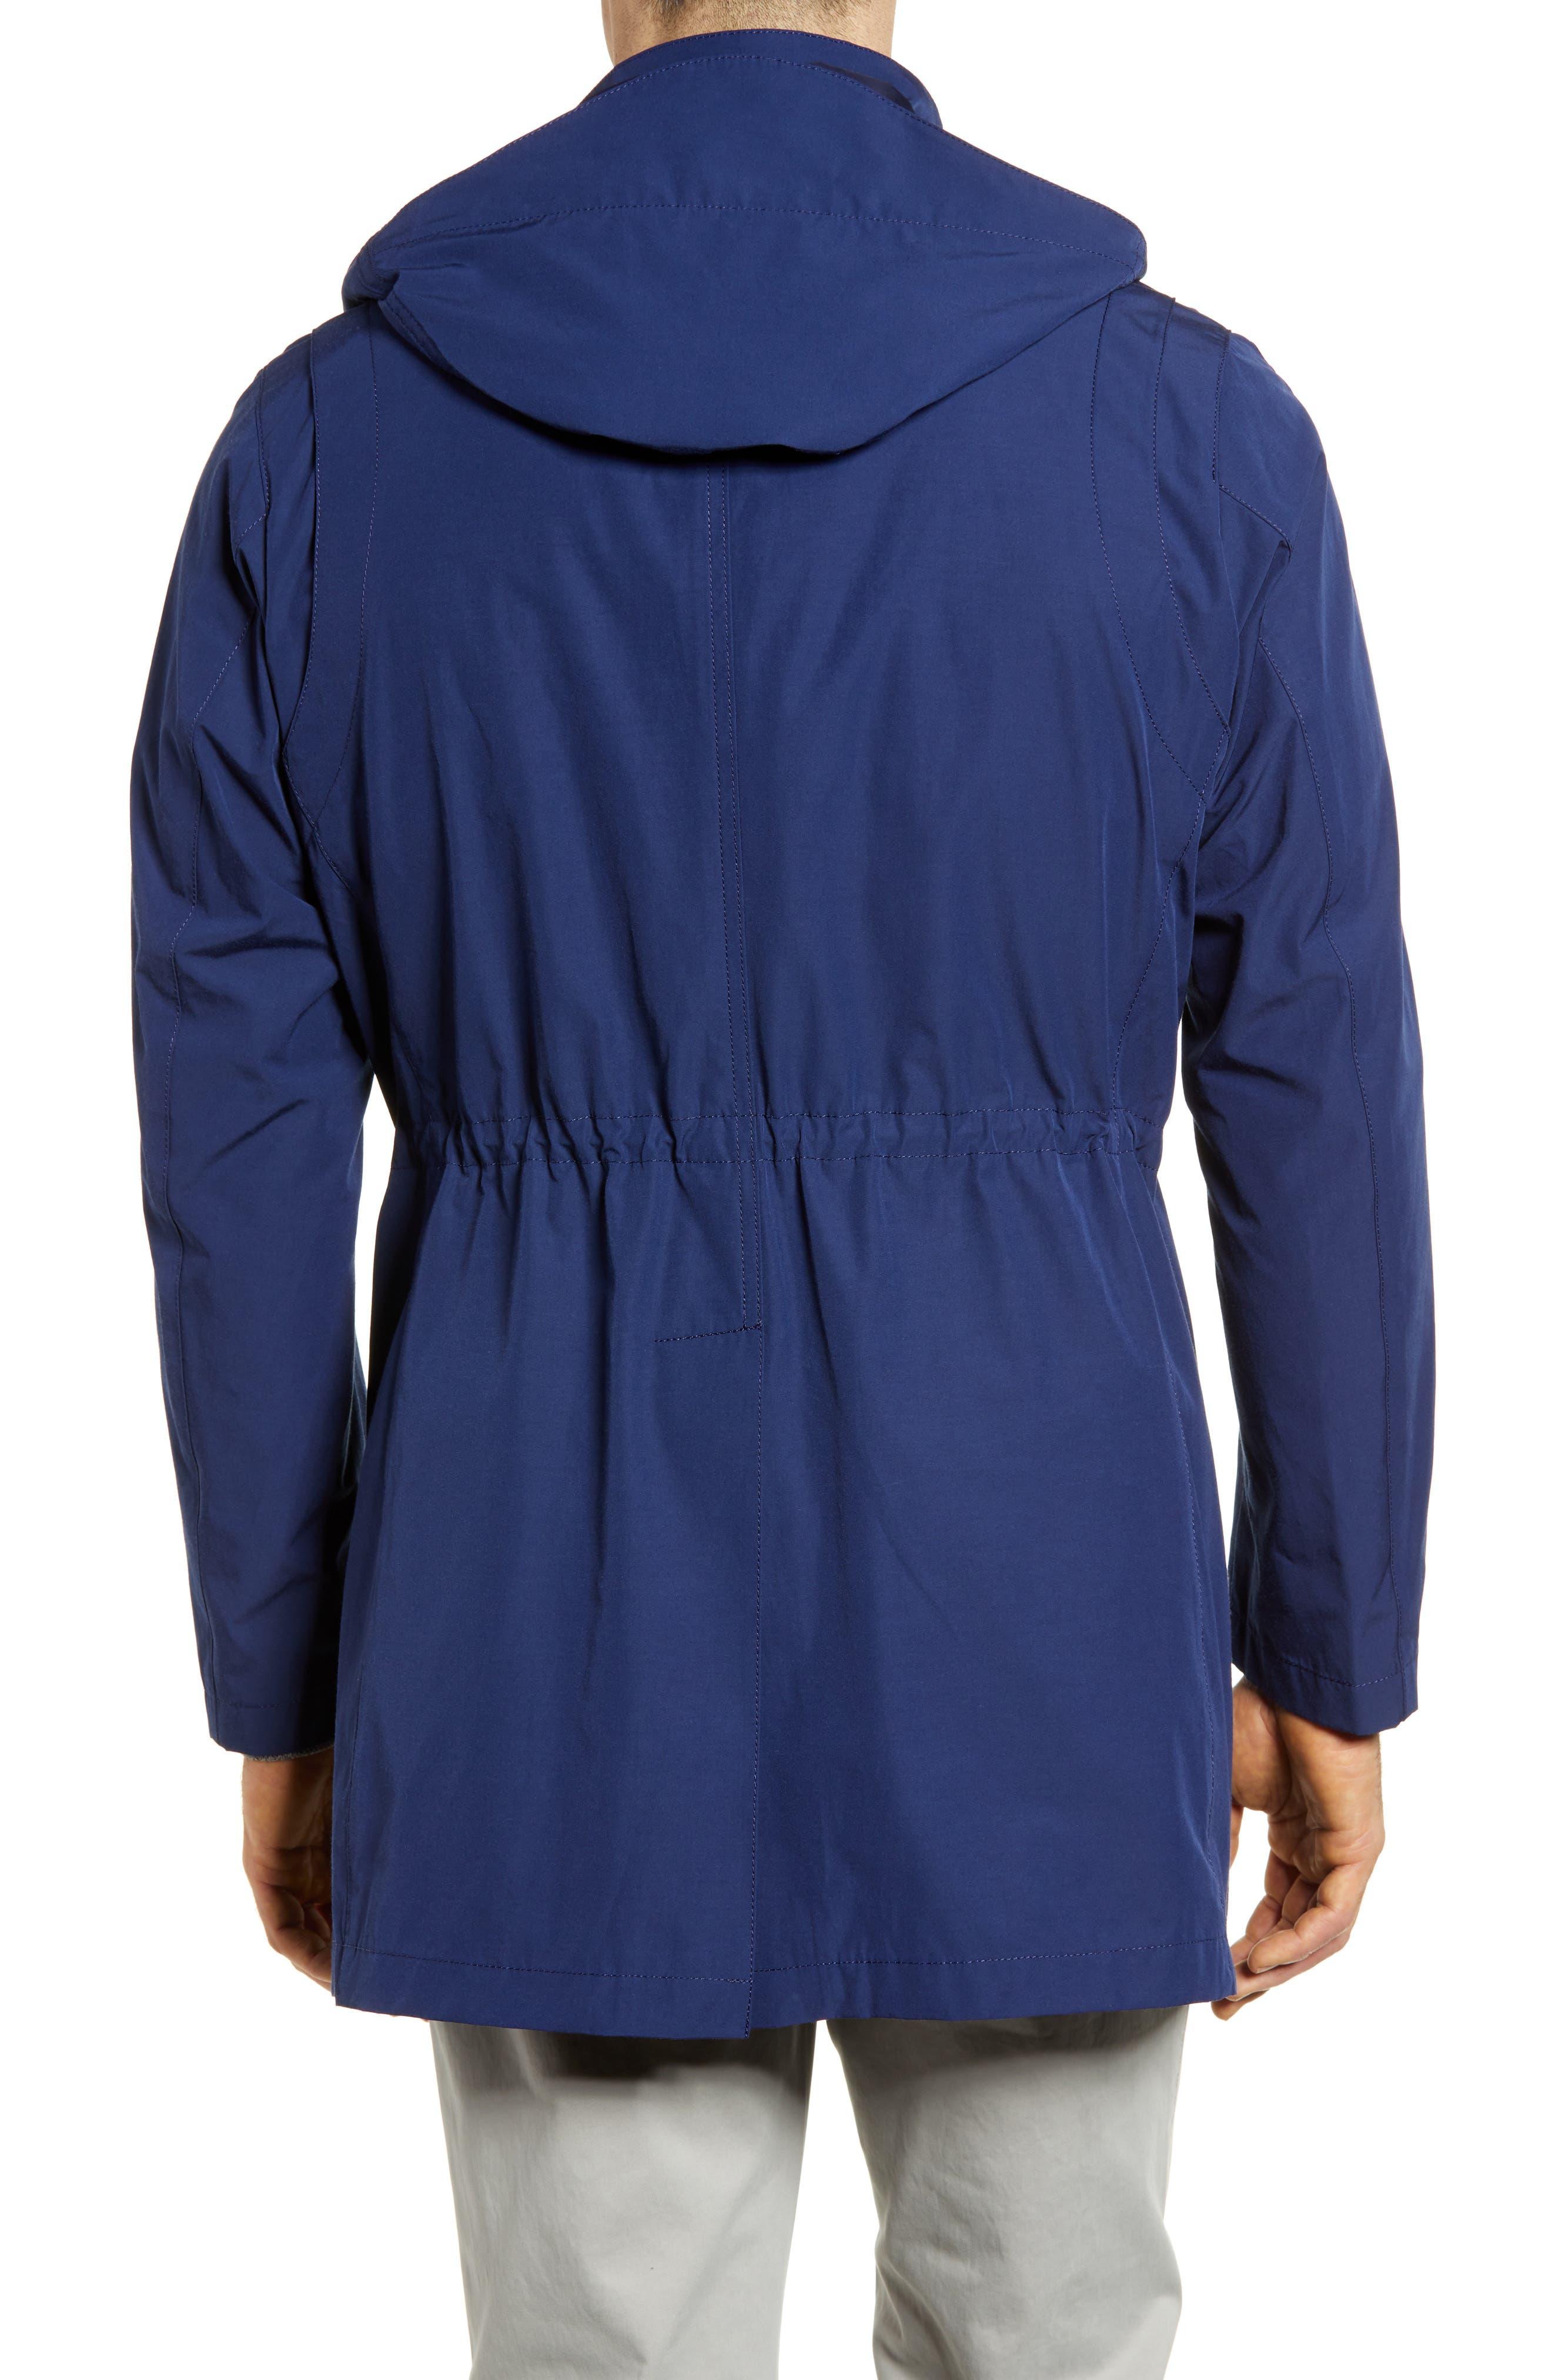 Getaway Raincoat,                             Alternate thumbnail 2, color,                             Royal Blue